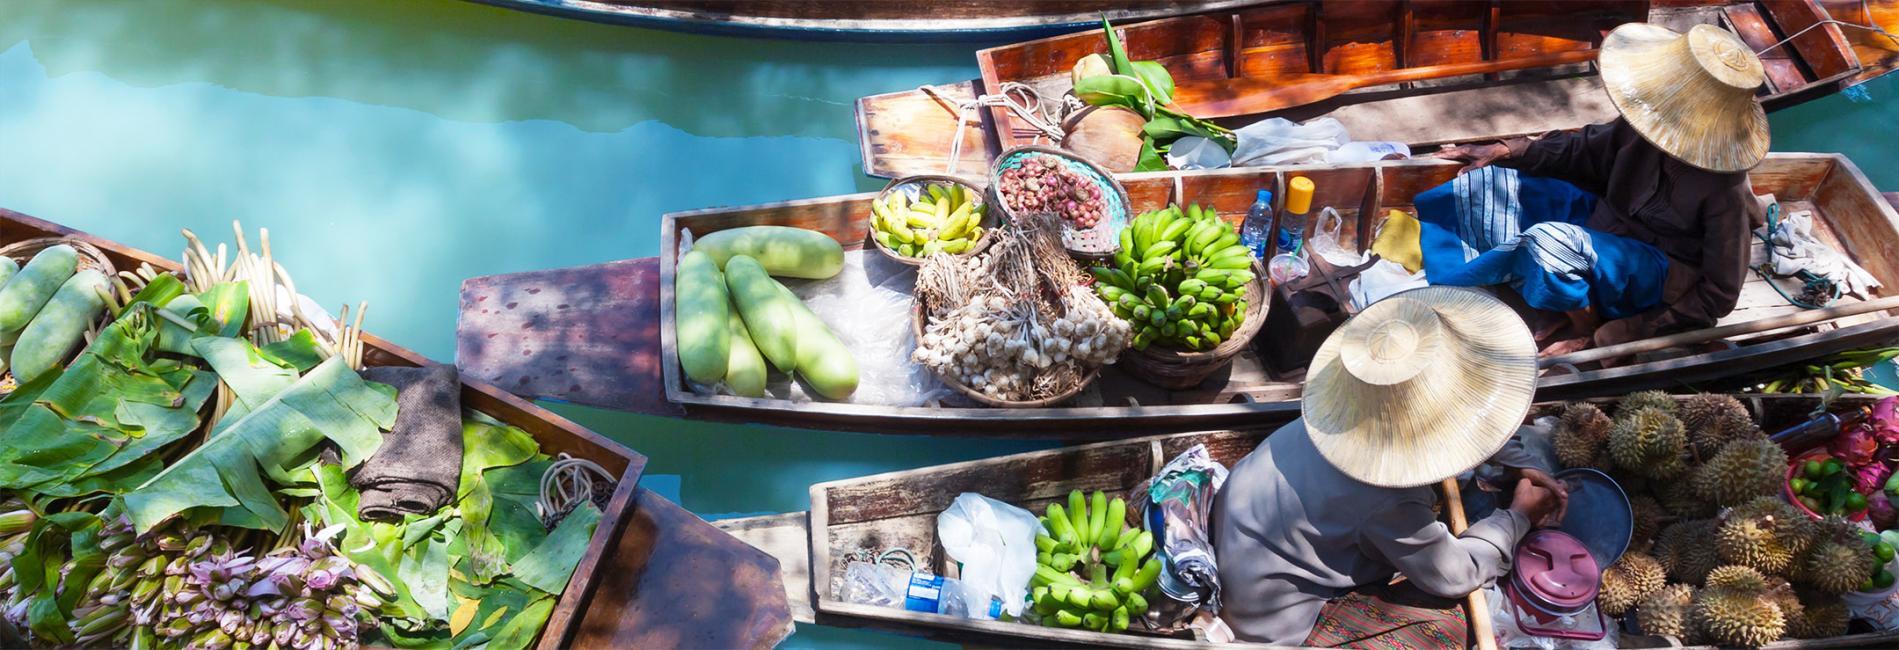 Touring Bangkok's Floating Market Train & Railway Markets